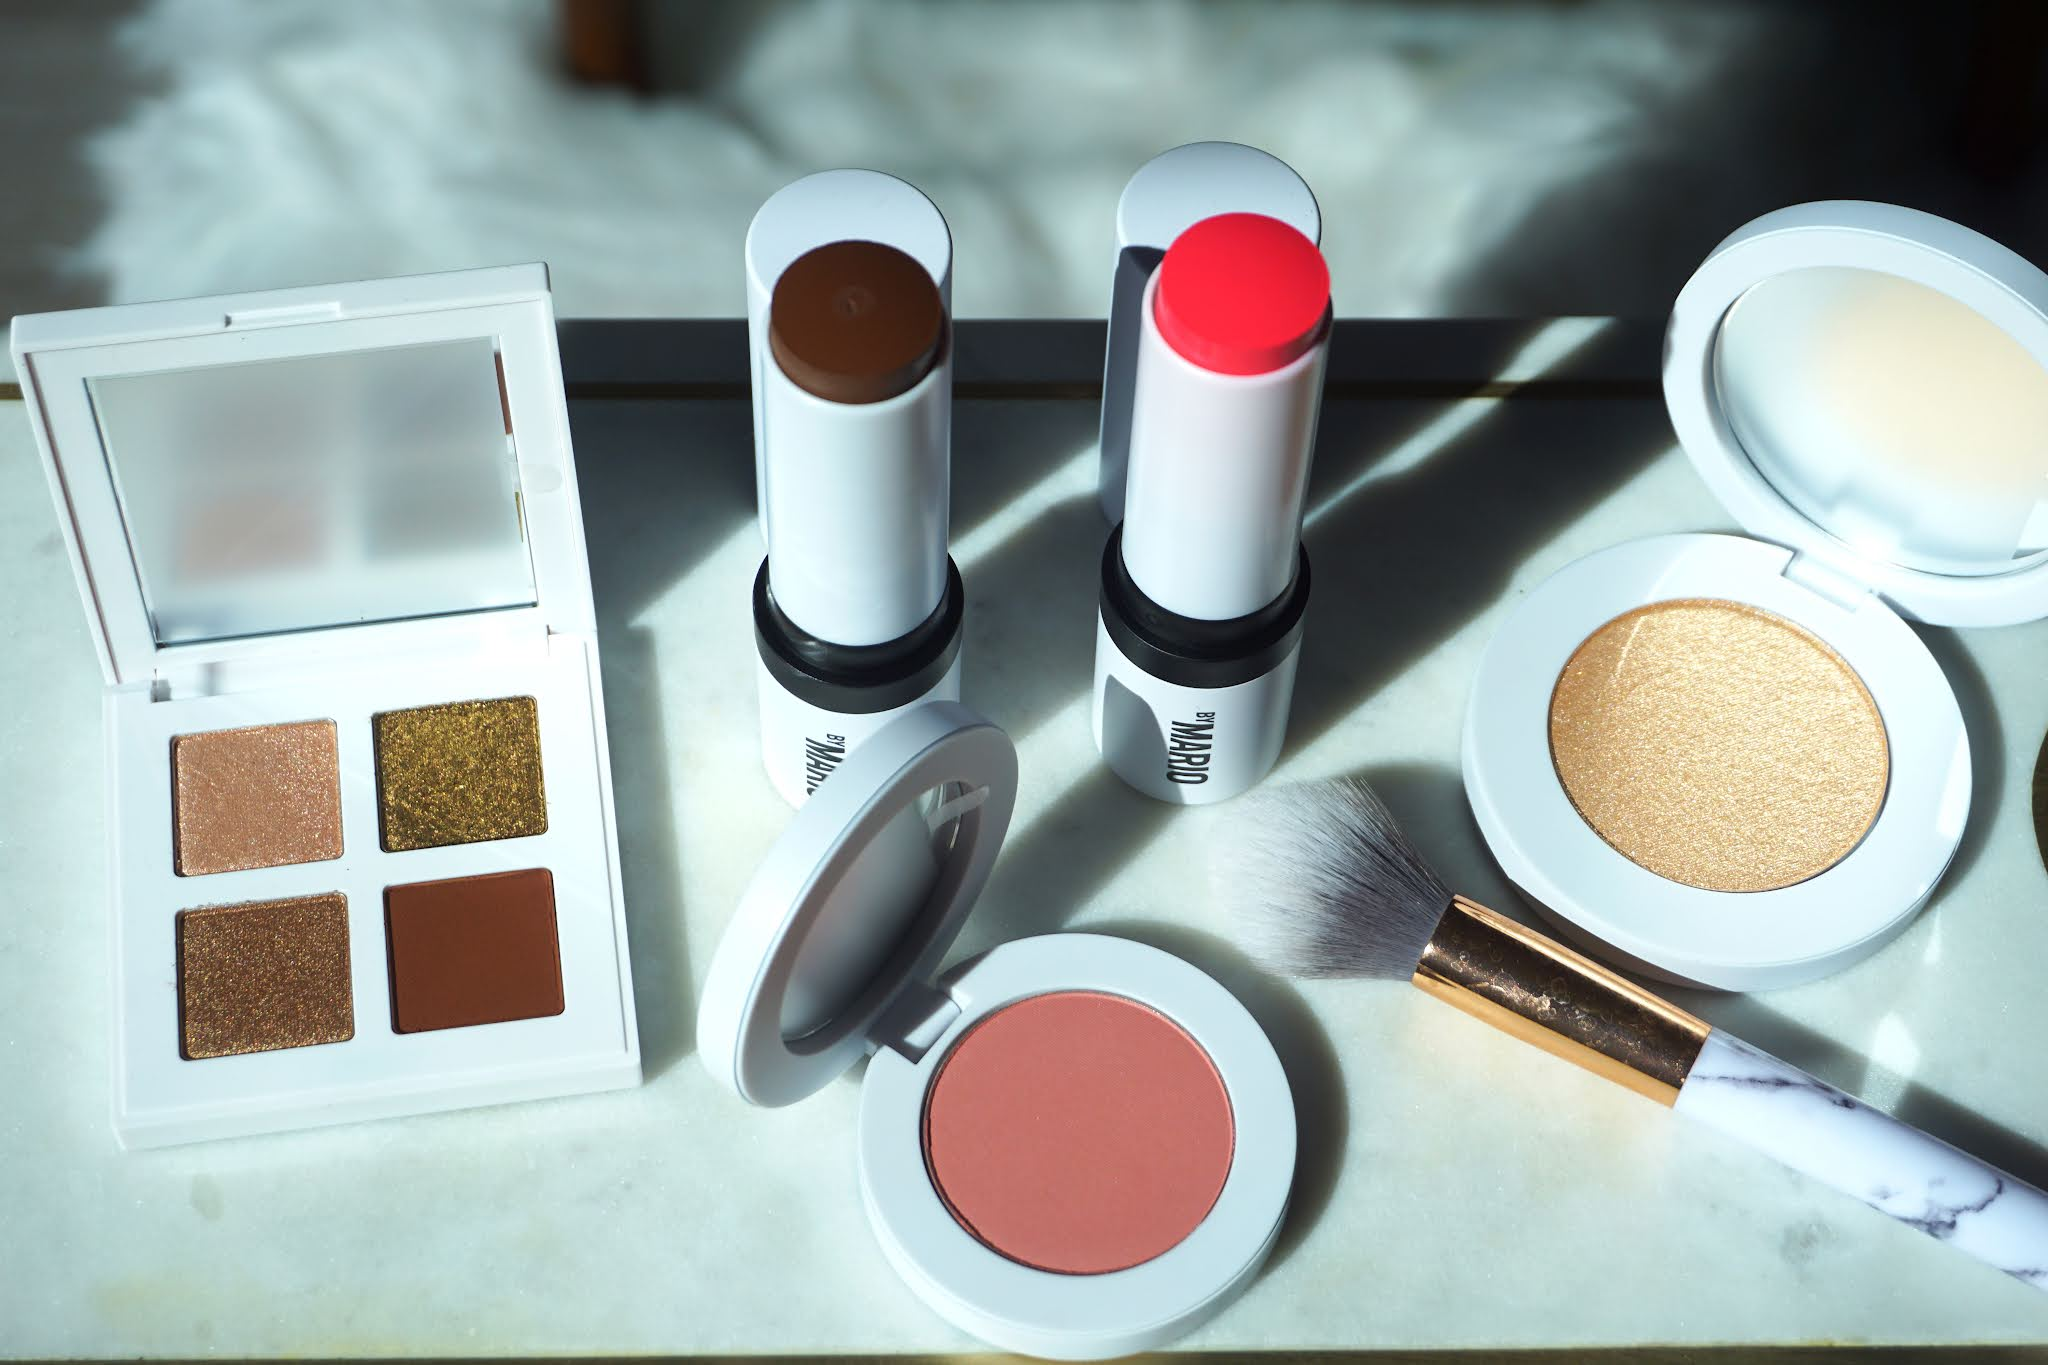 Makeup by Mario Eyeshadow Palette